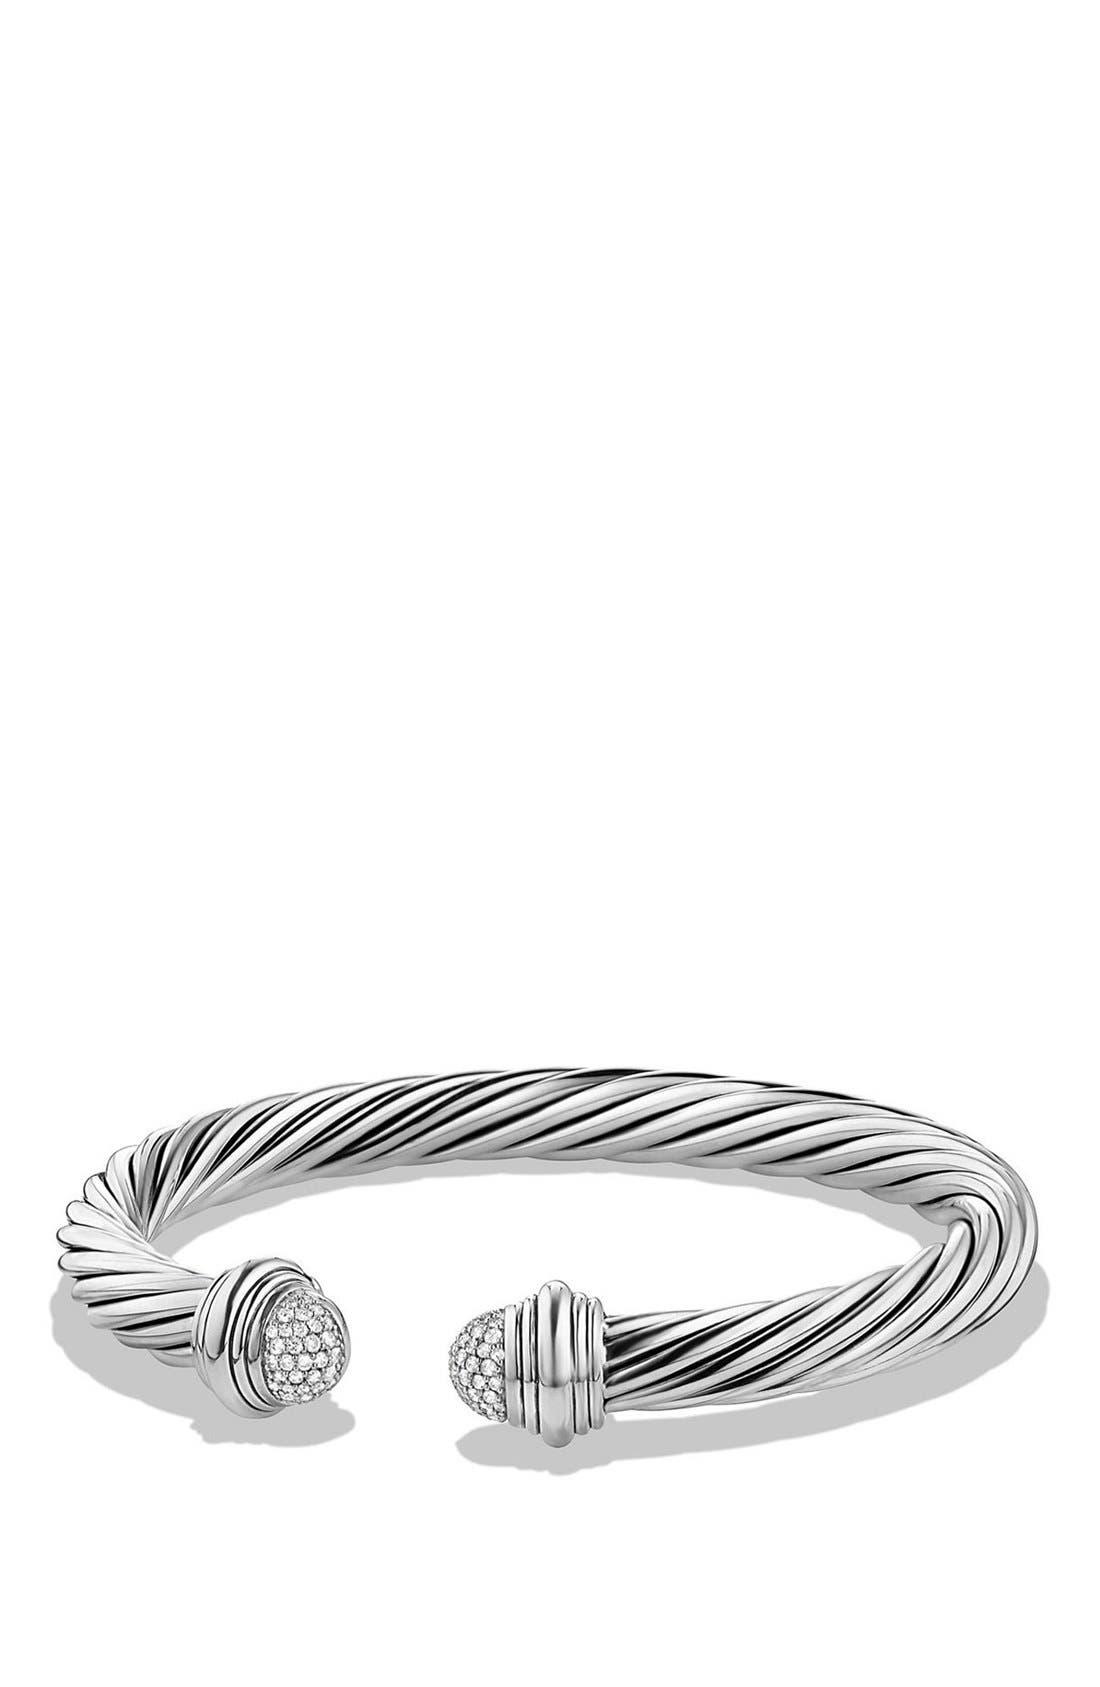 Cable Classics Bracelet with Black Diamonds, 7mm,                         Main,                         color, Silver